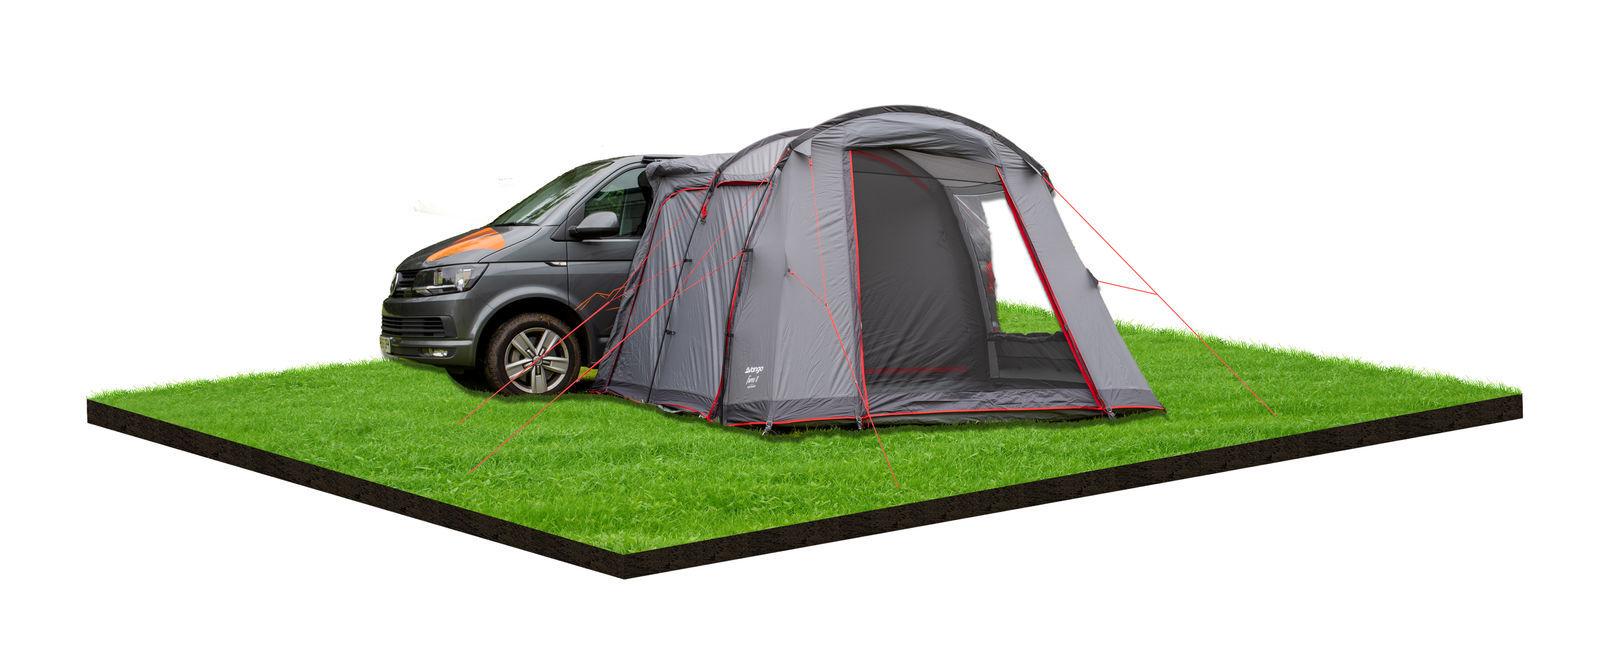 Vango Faros Low Poled 2021 Norwich Camping 5